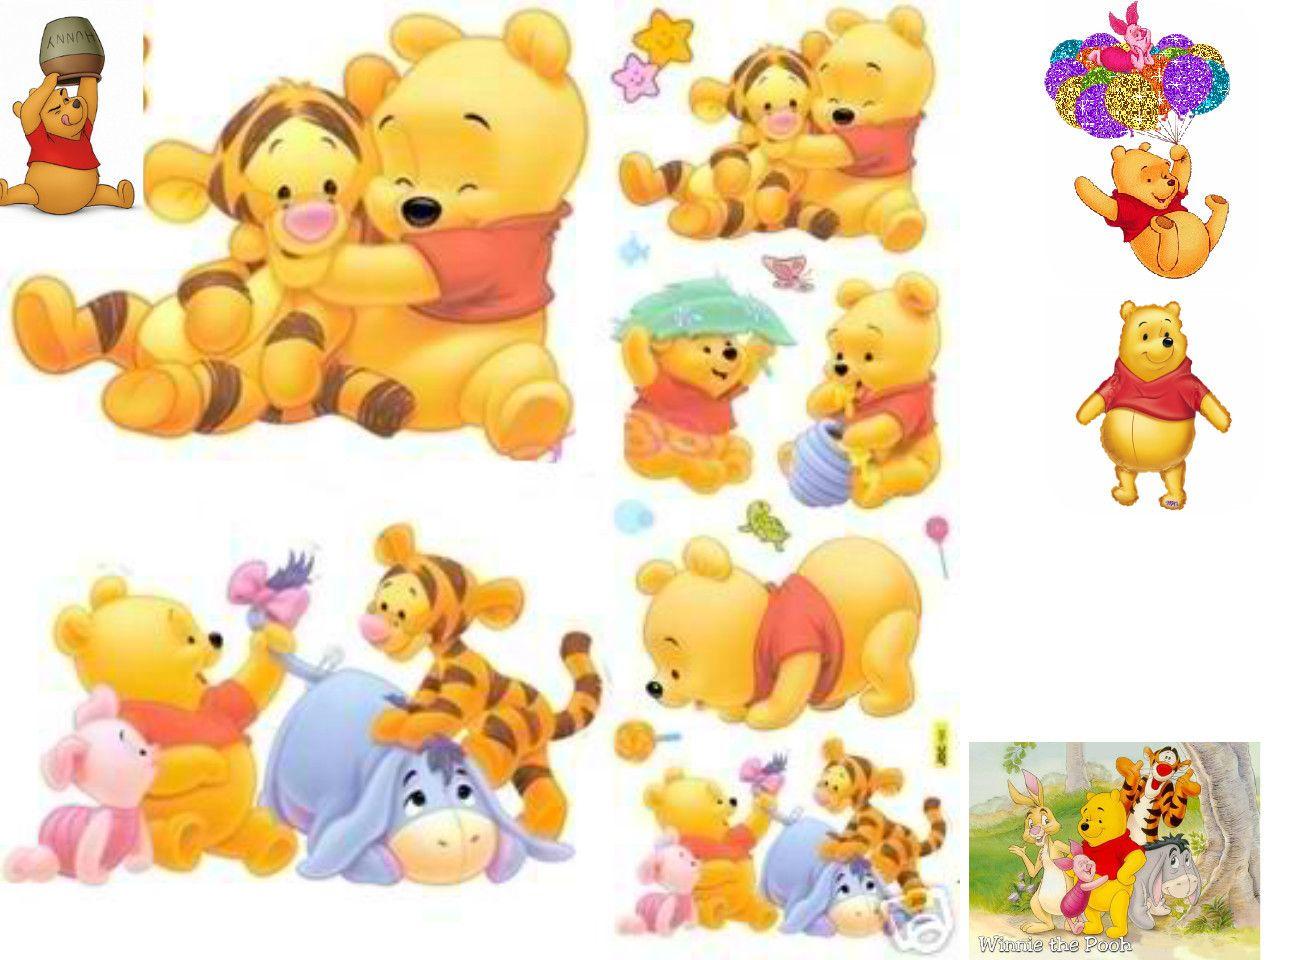 pooh and friends | winnie the pooh & friends | Clip art | Pinterest ...